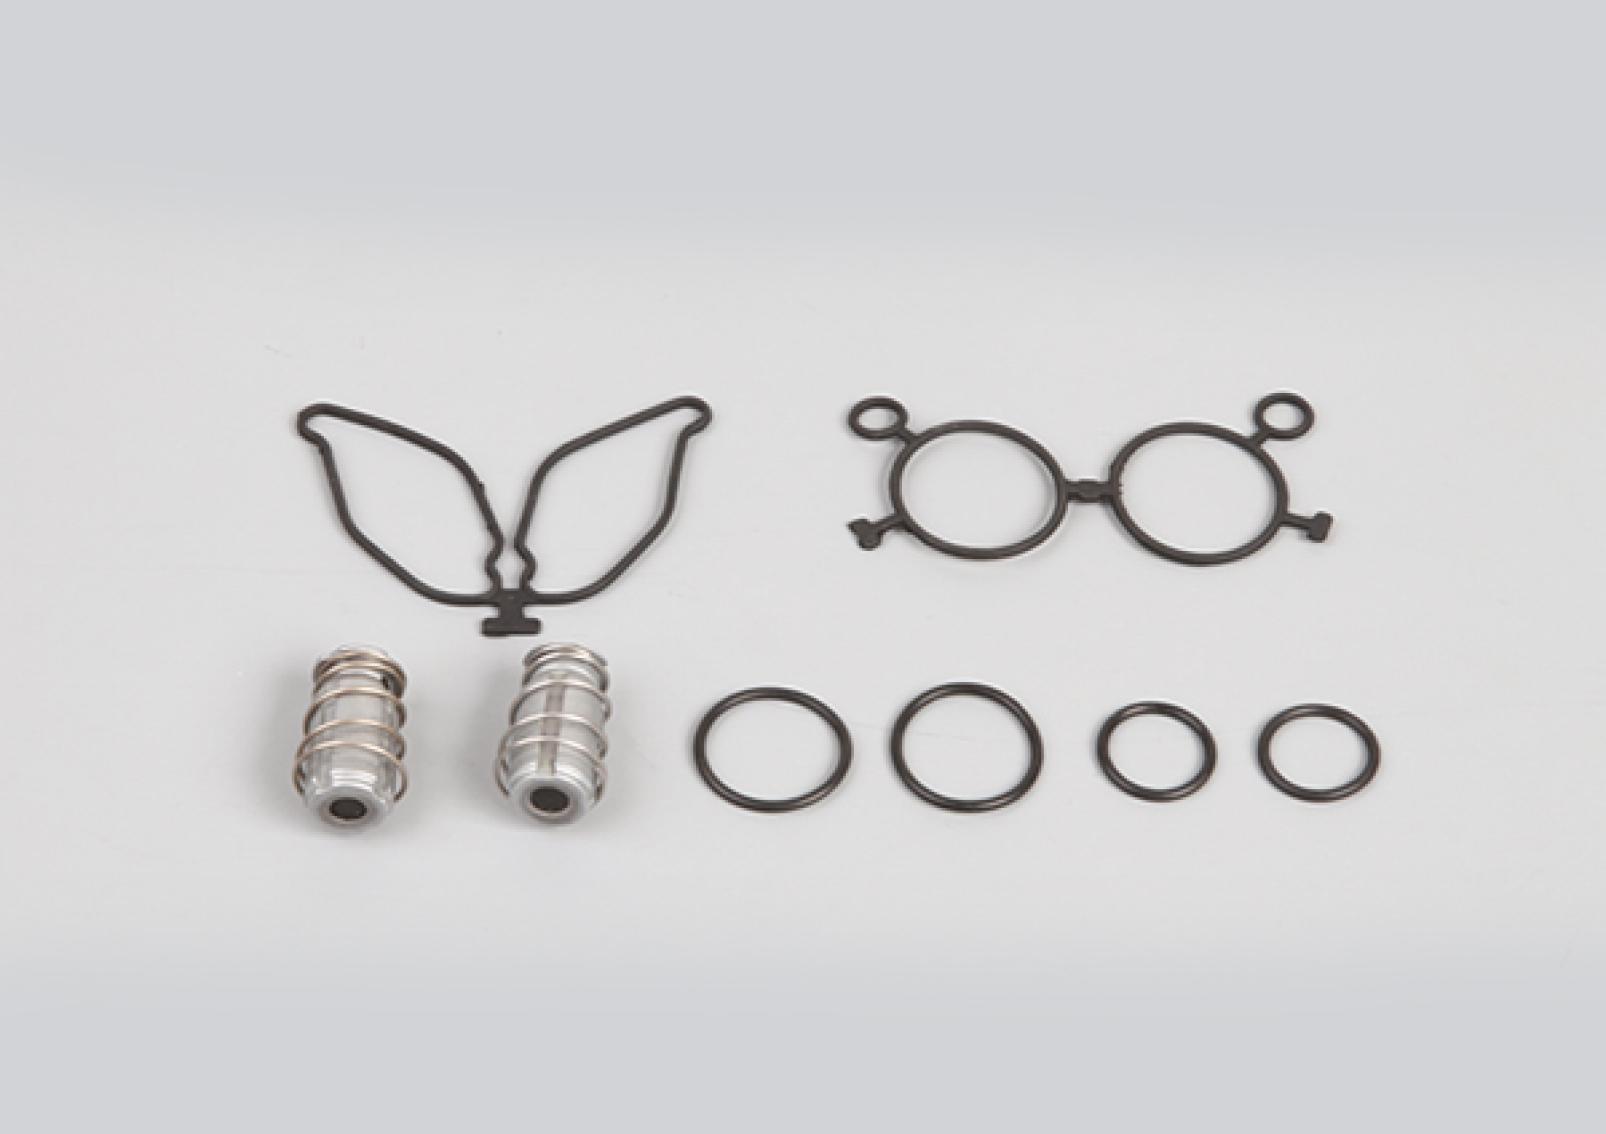 Gearbox Valve Repair Kit 0025403997, 4422302221, 4724000012